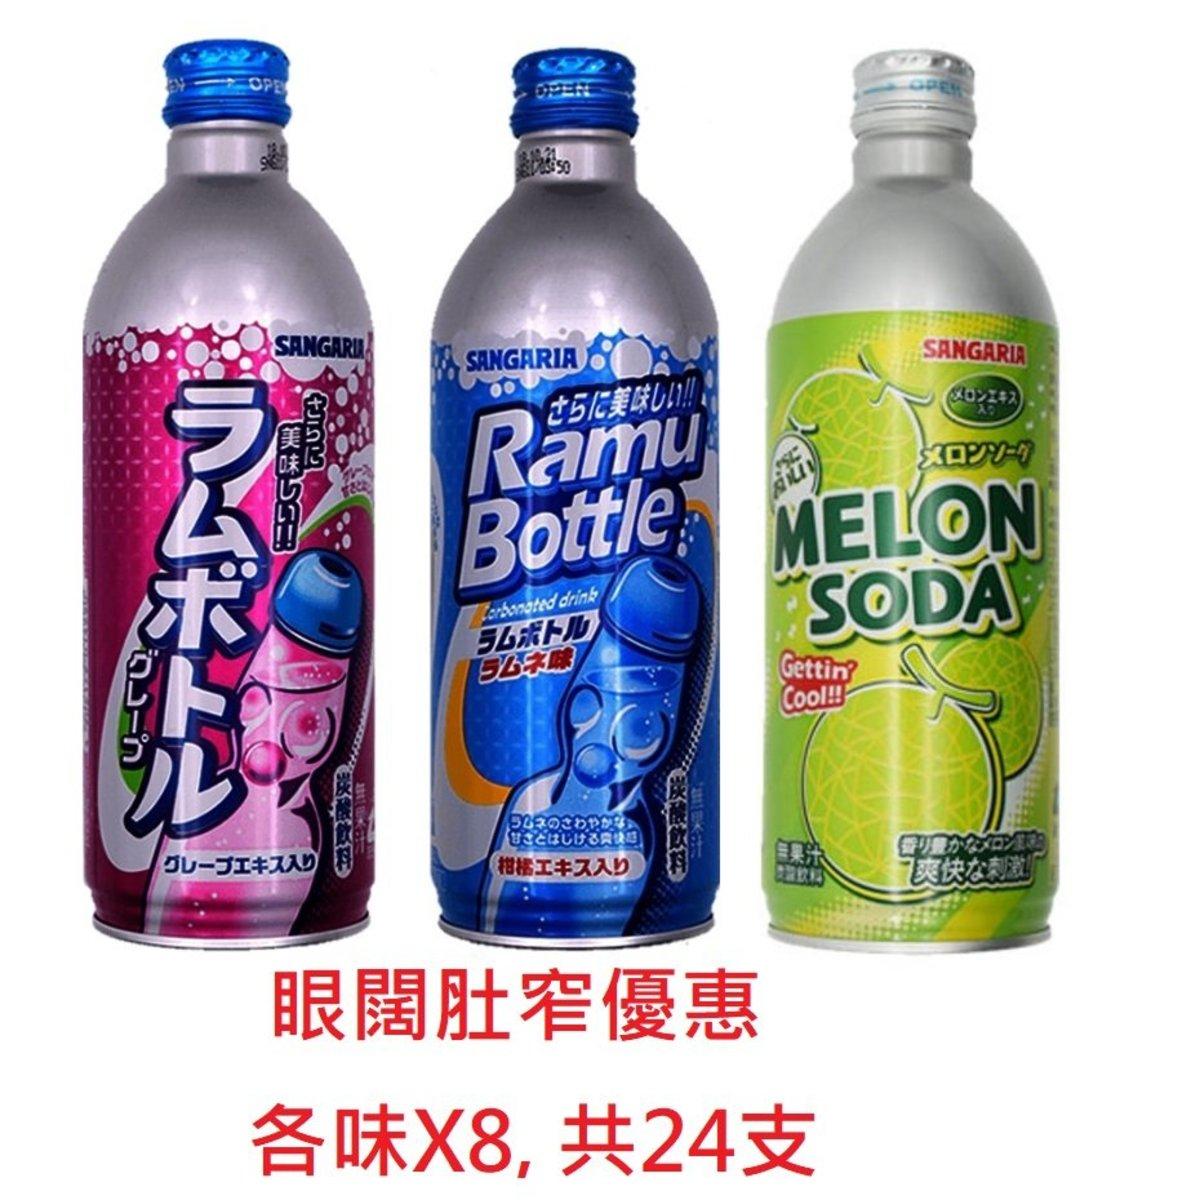 (Special Bulk Mix Offer) Carbonate Soft Drink Bottle Lemonade - Melon Grape Soda Flavor 500ml x 24